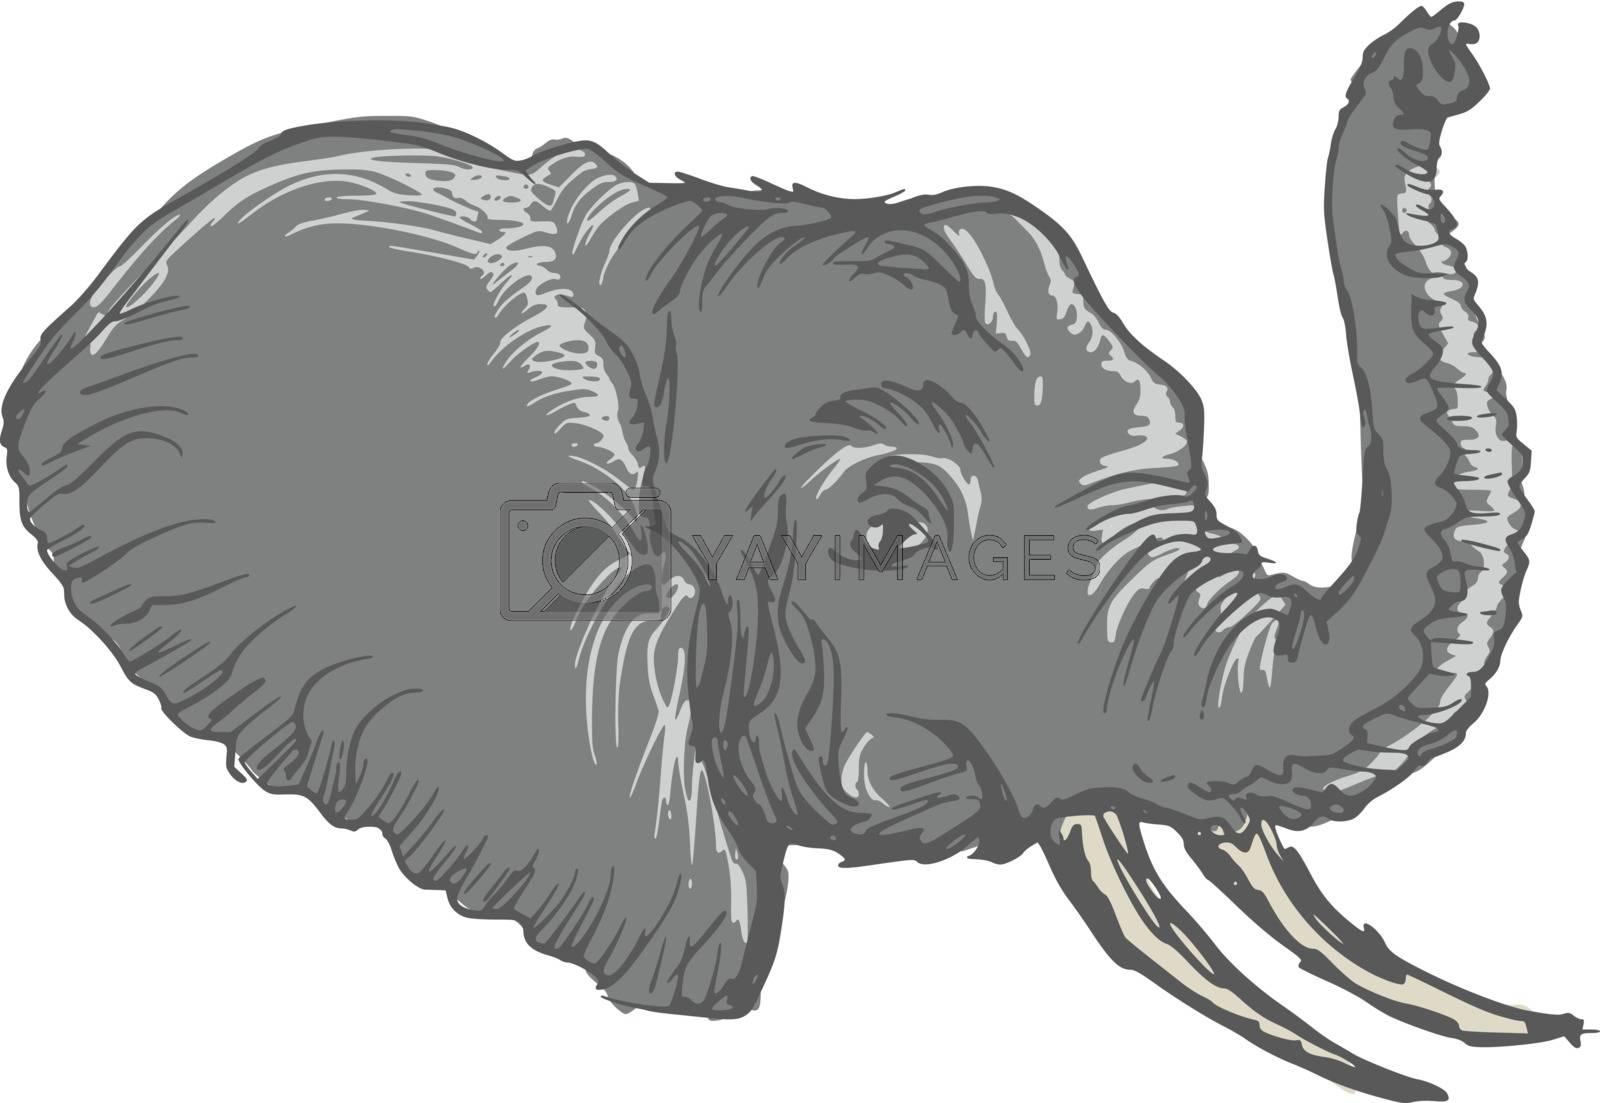 hand drawn, sketch, cartoon illustration of head of elephant